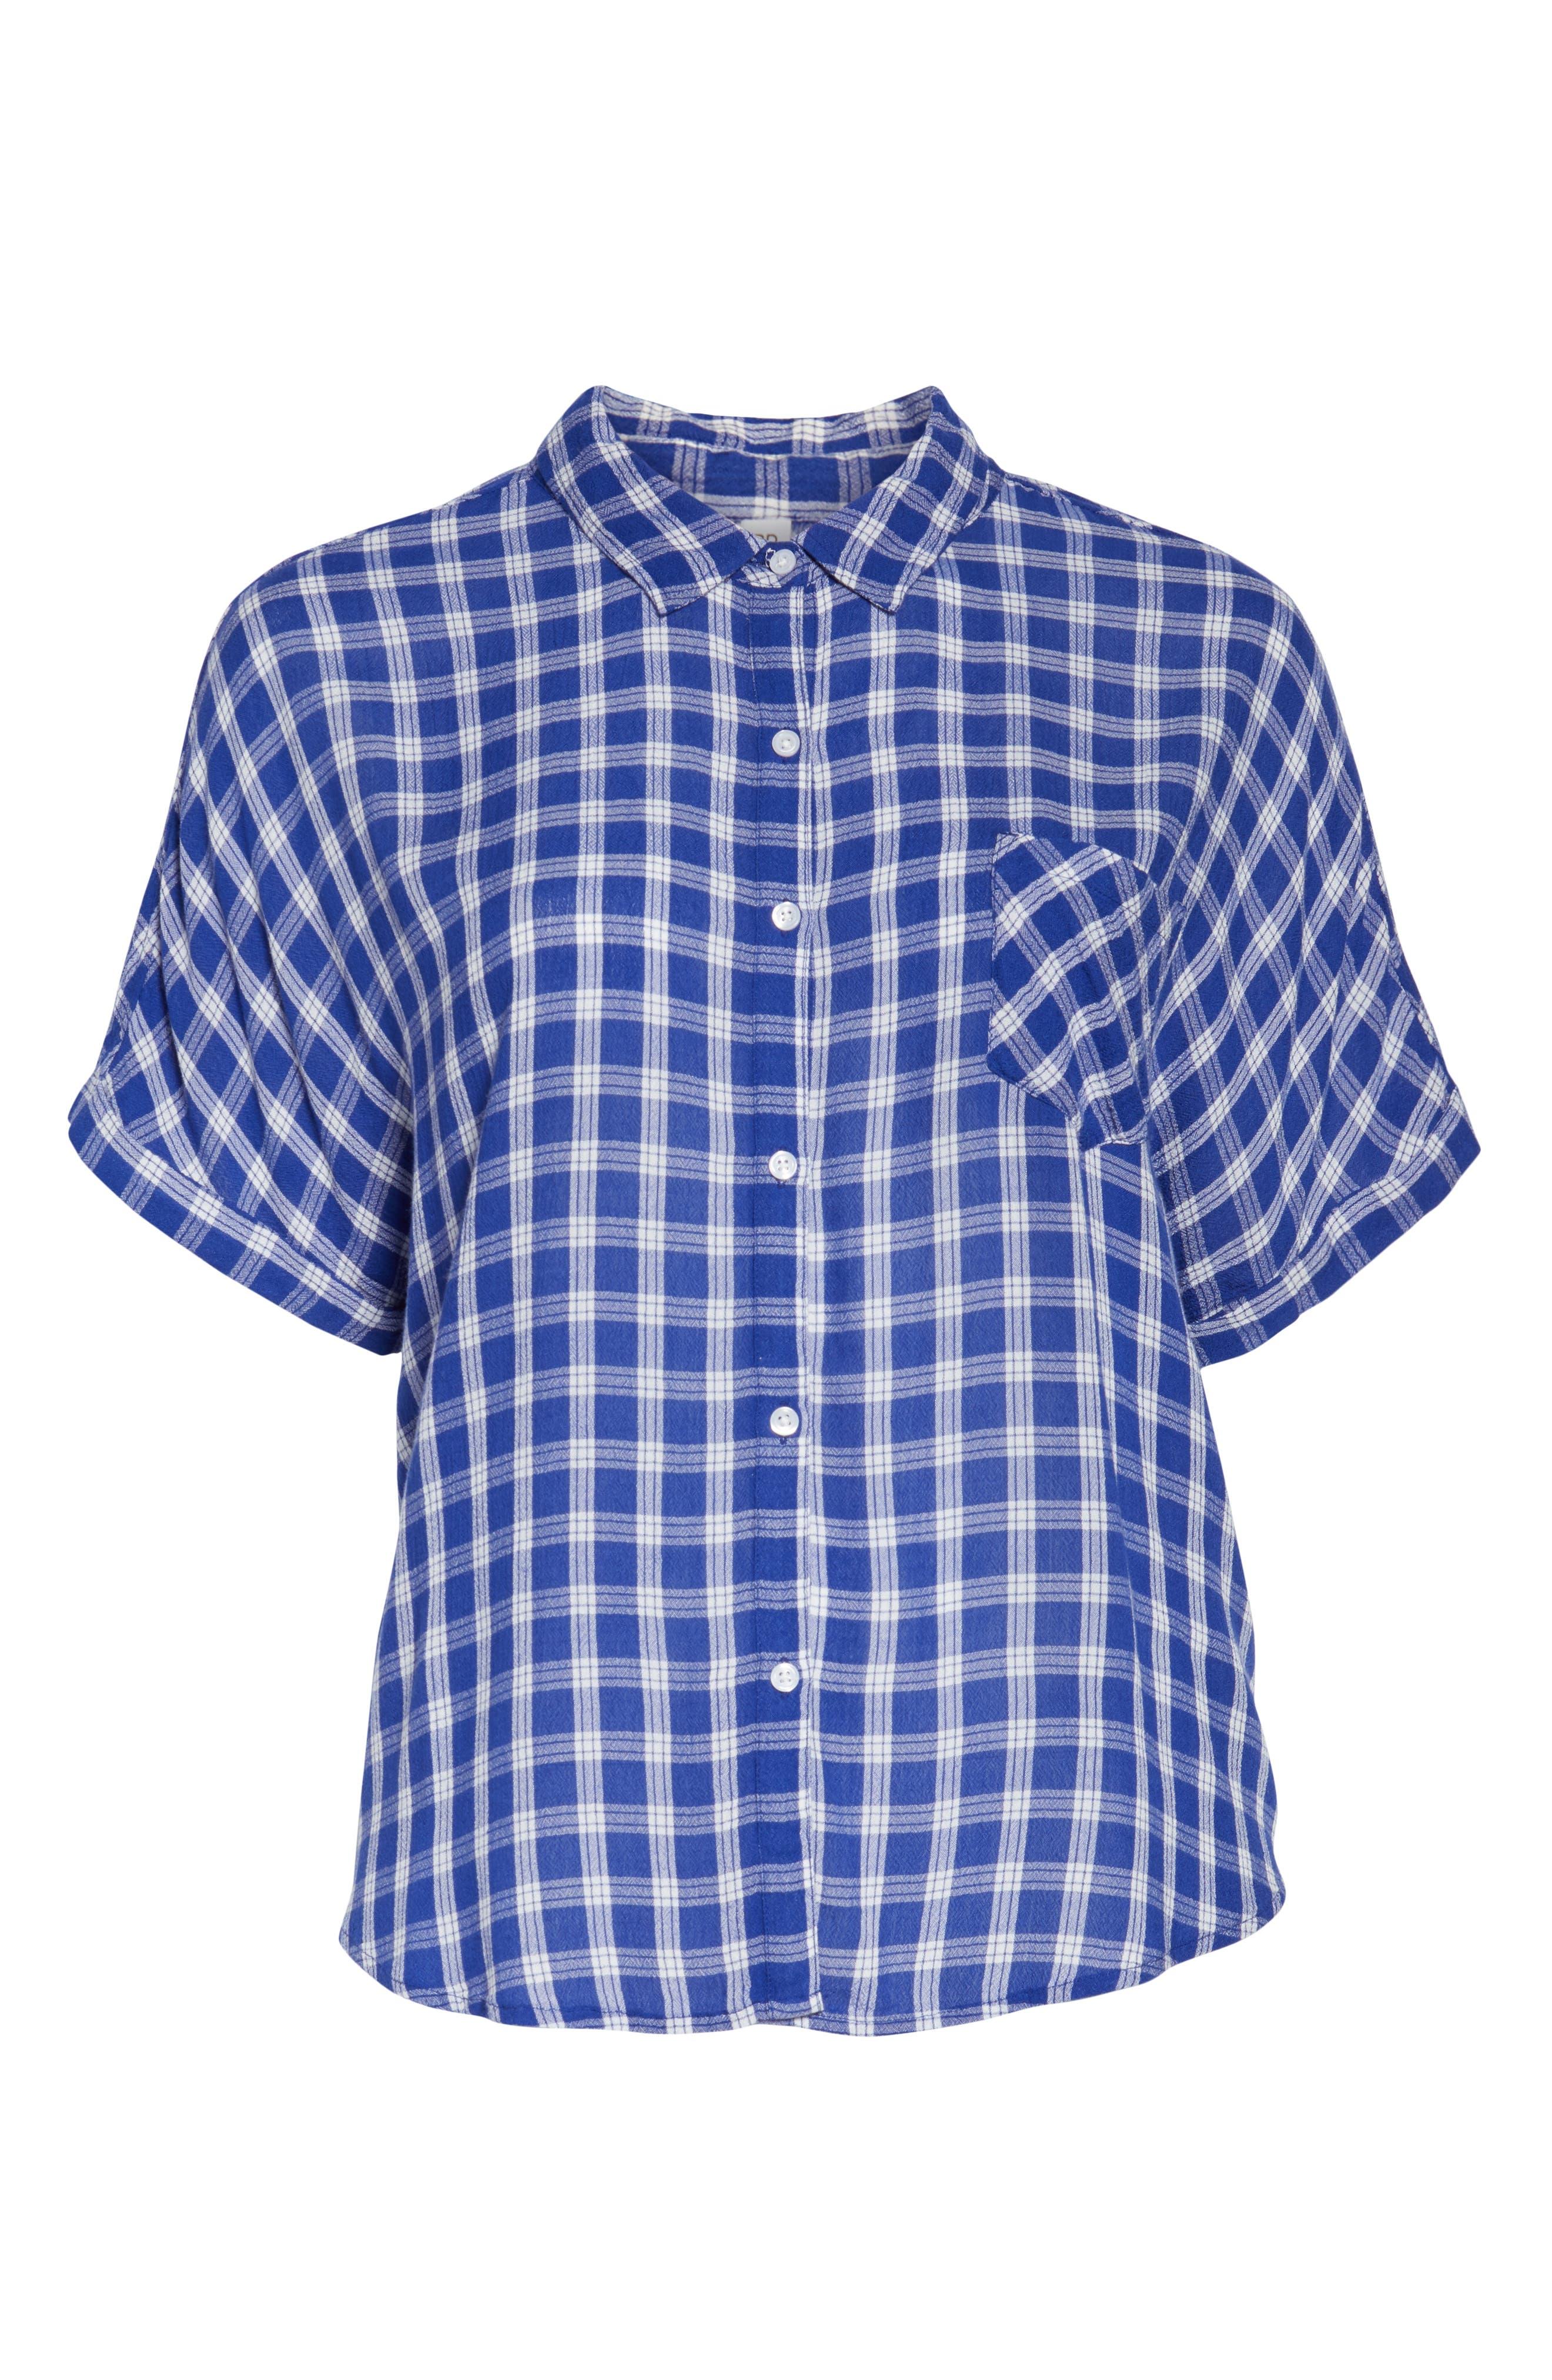 BP., Plaid Dolman Sleeve Shirt, Alternate thumbnail 12, color, 420